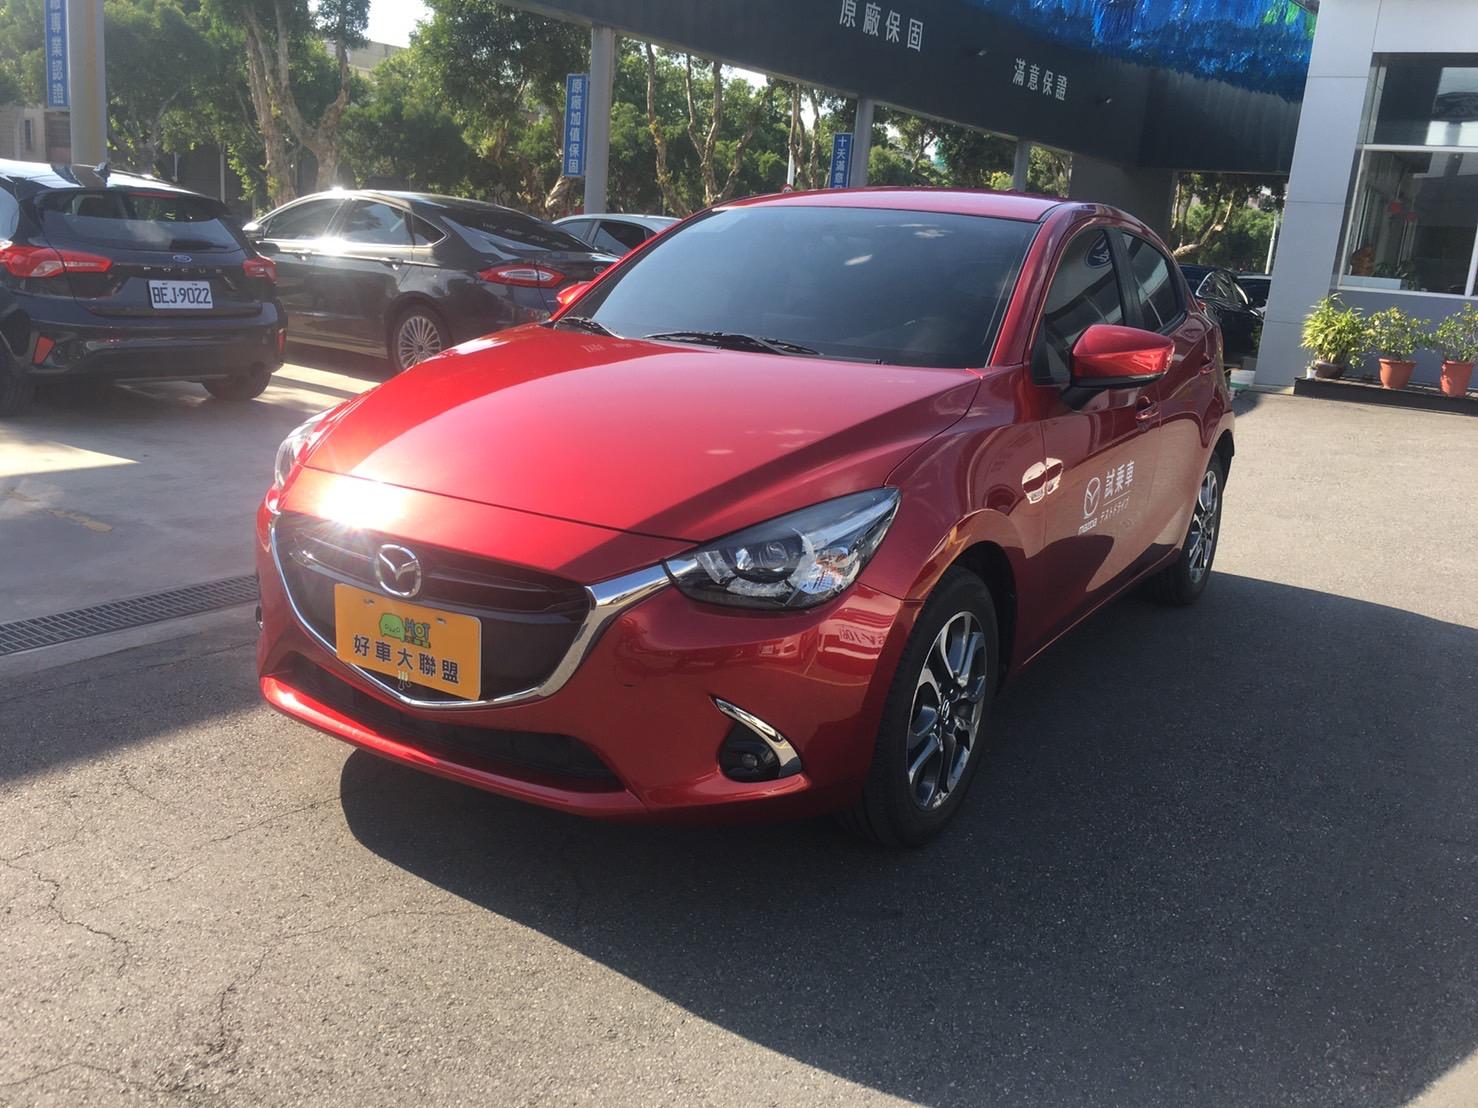 2018 Mazda 馬自達 2